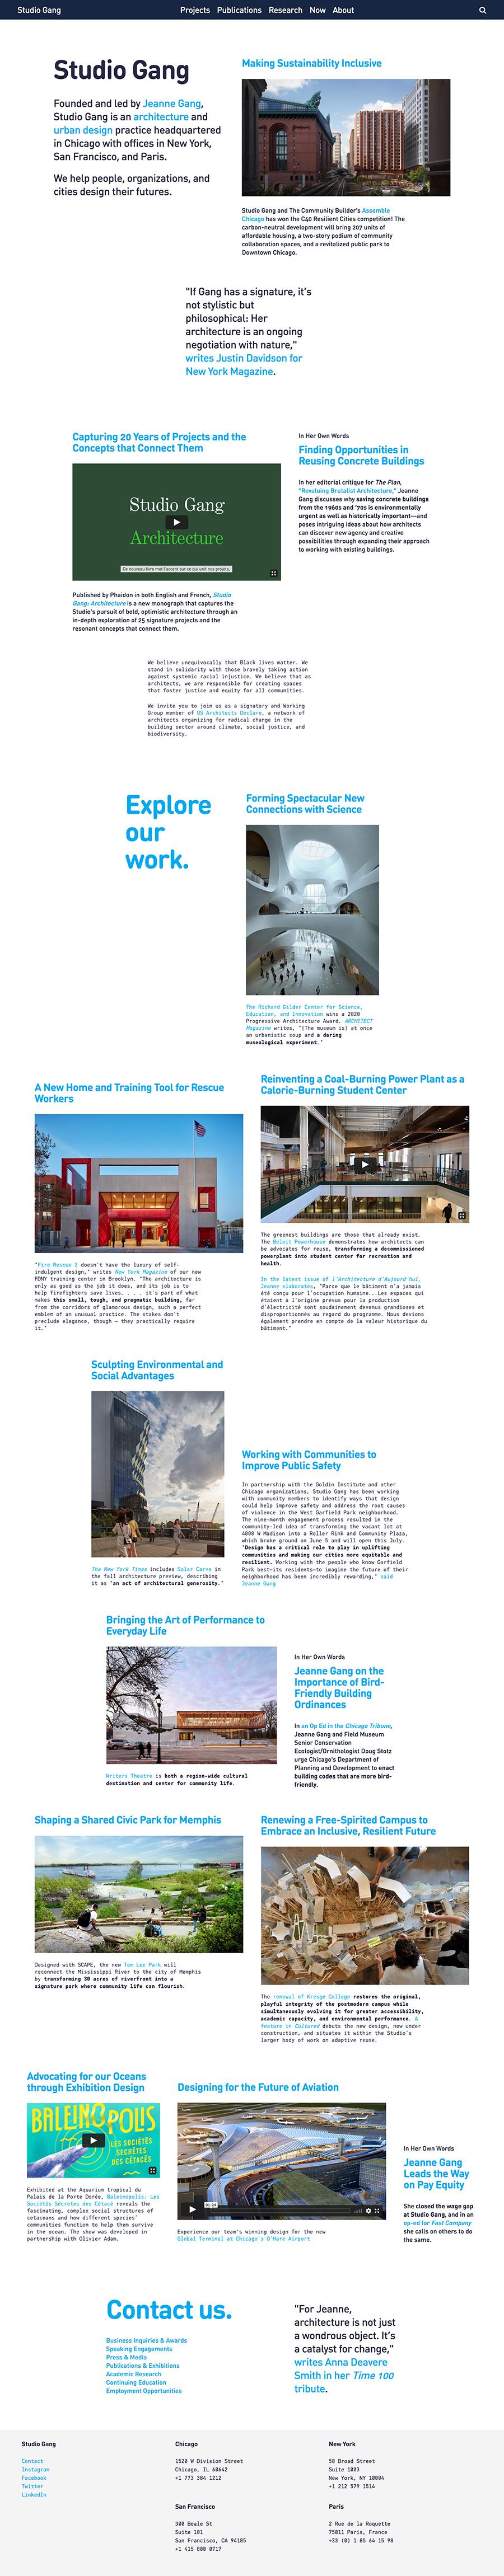 Studio Gang Best Architecture Website